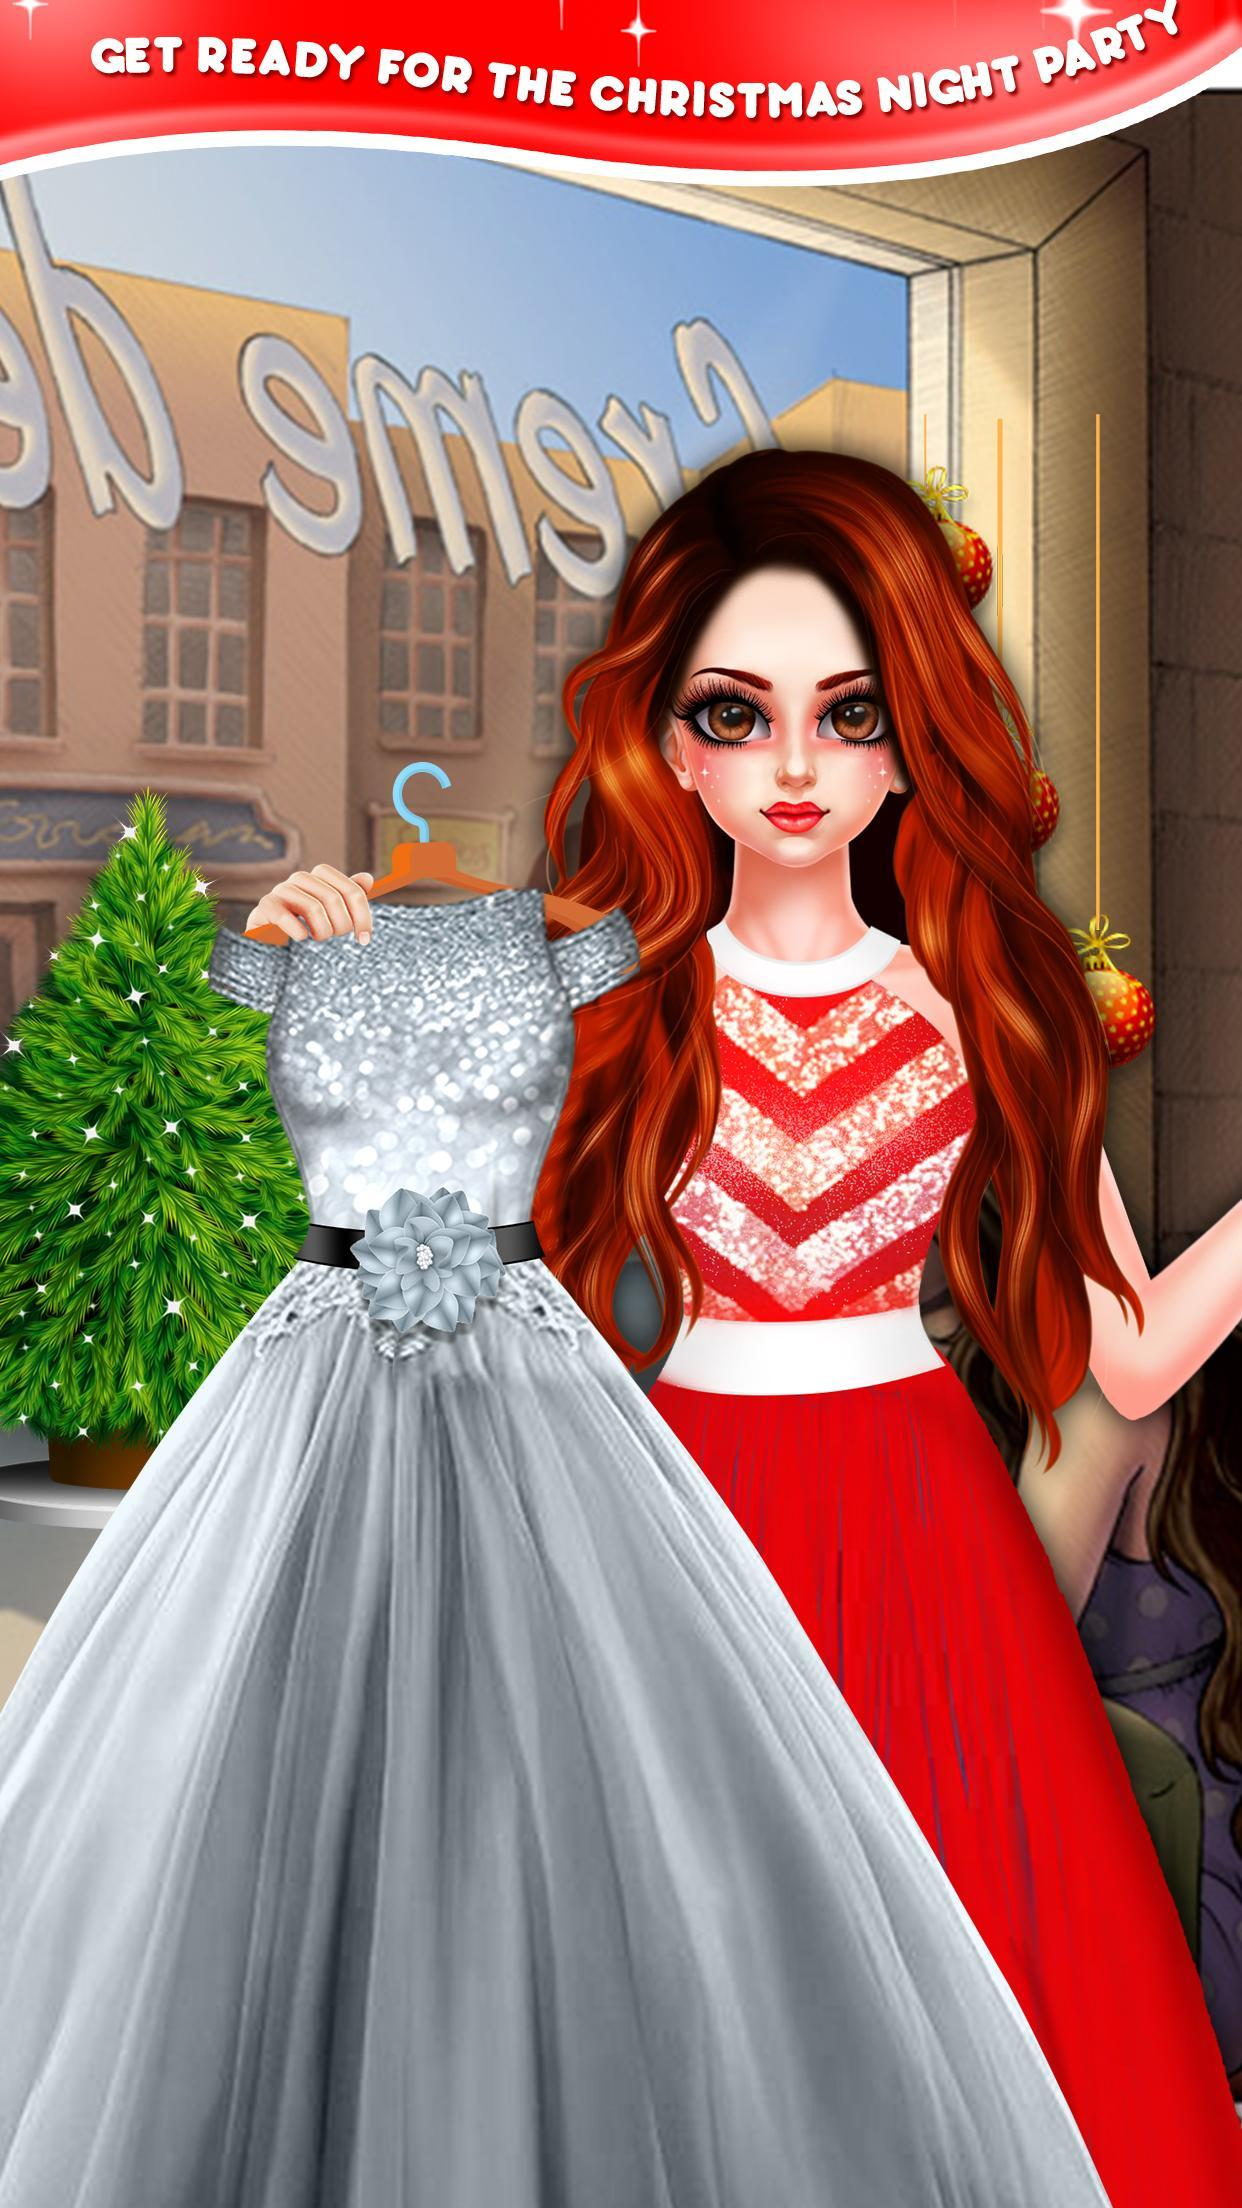 Christmas Night Celebration Girl Spa & Decor Game 2.2 Screenshot 3